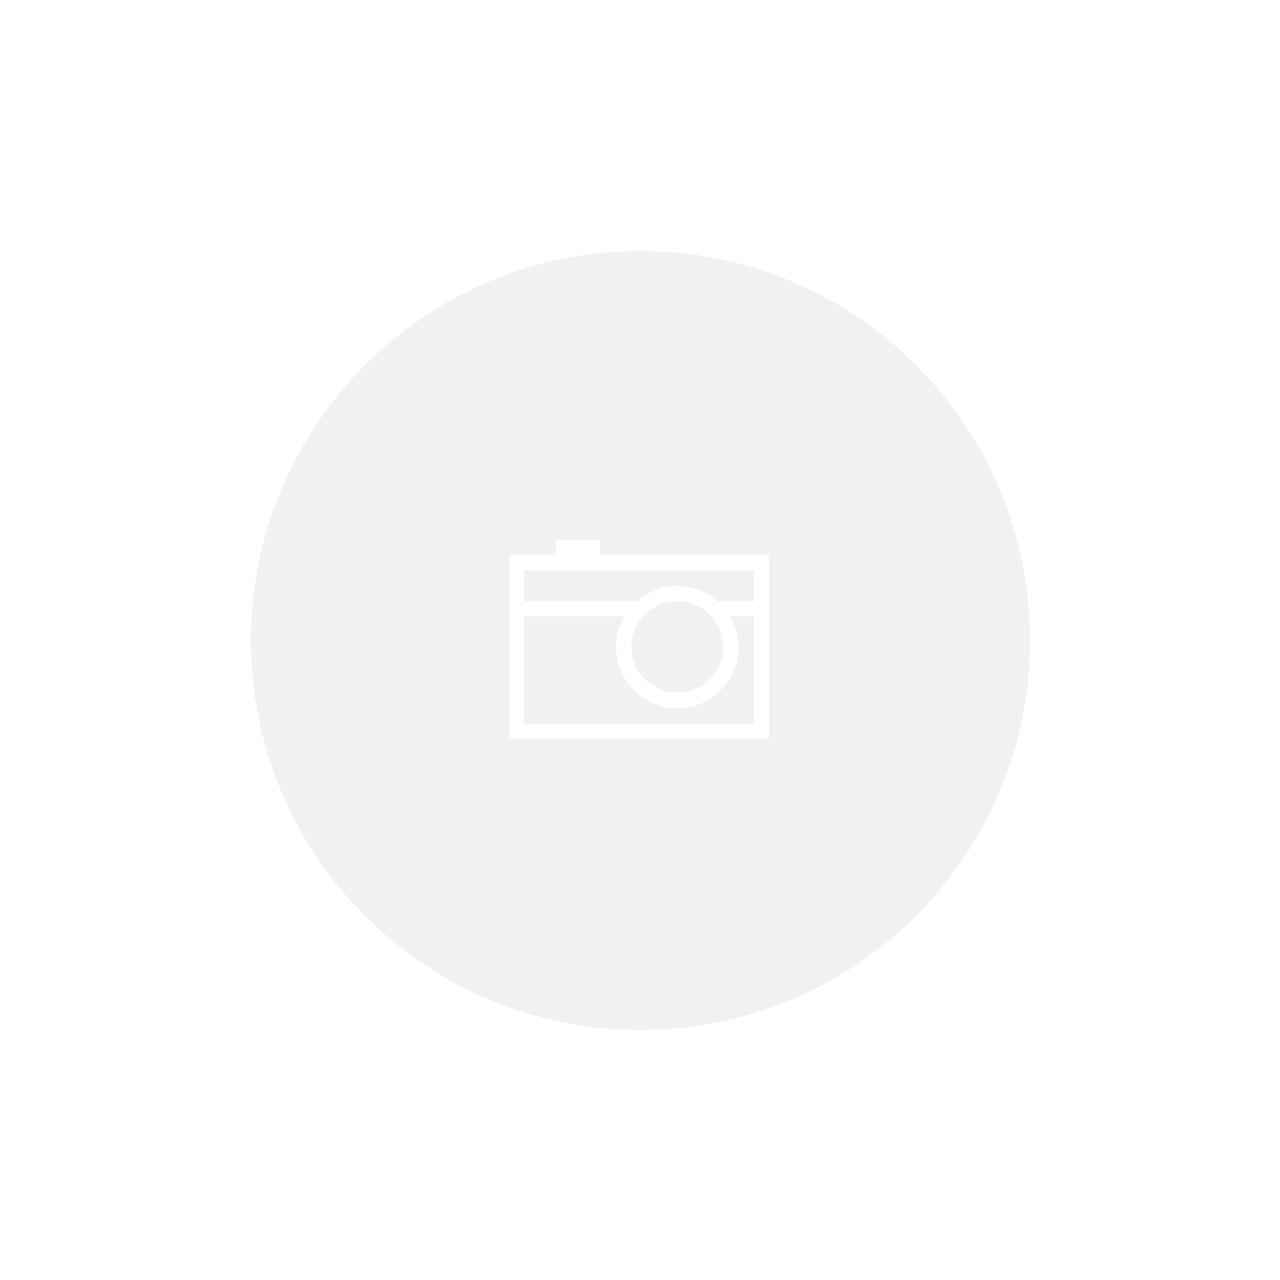 CARAMANHOLA 500ML TACX SHIVA QUICK - OGIGINAL